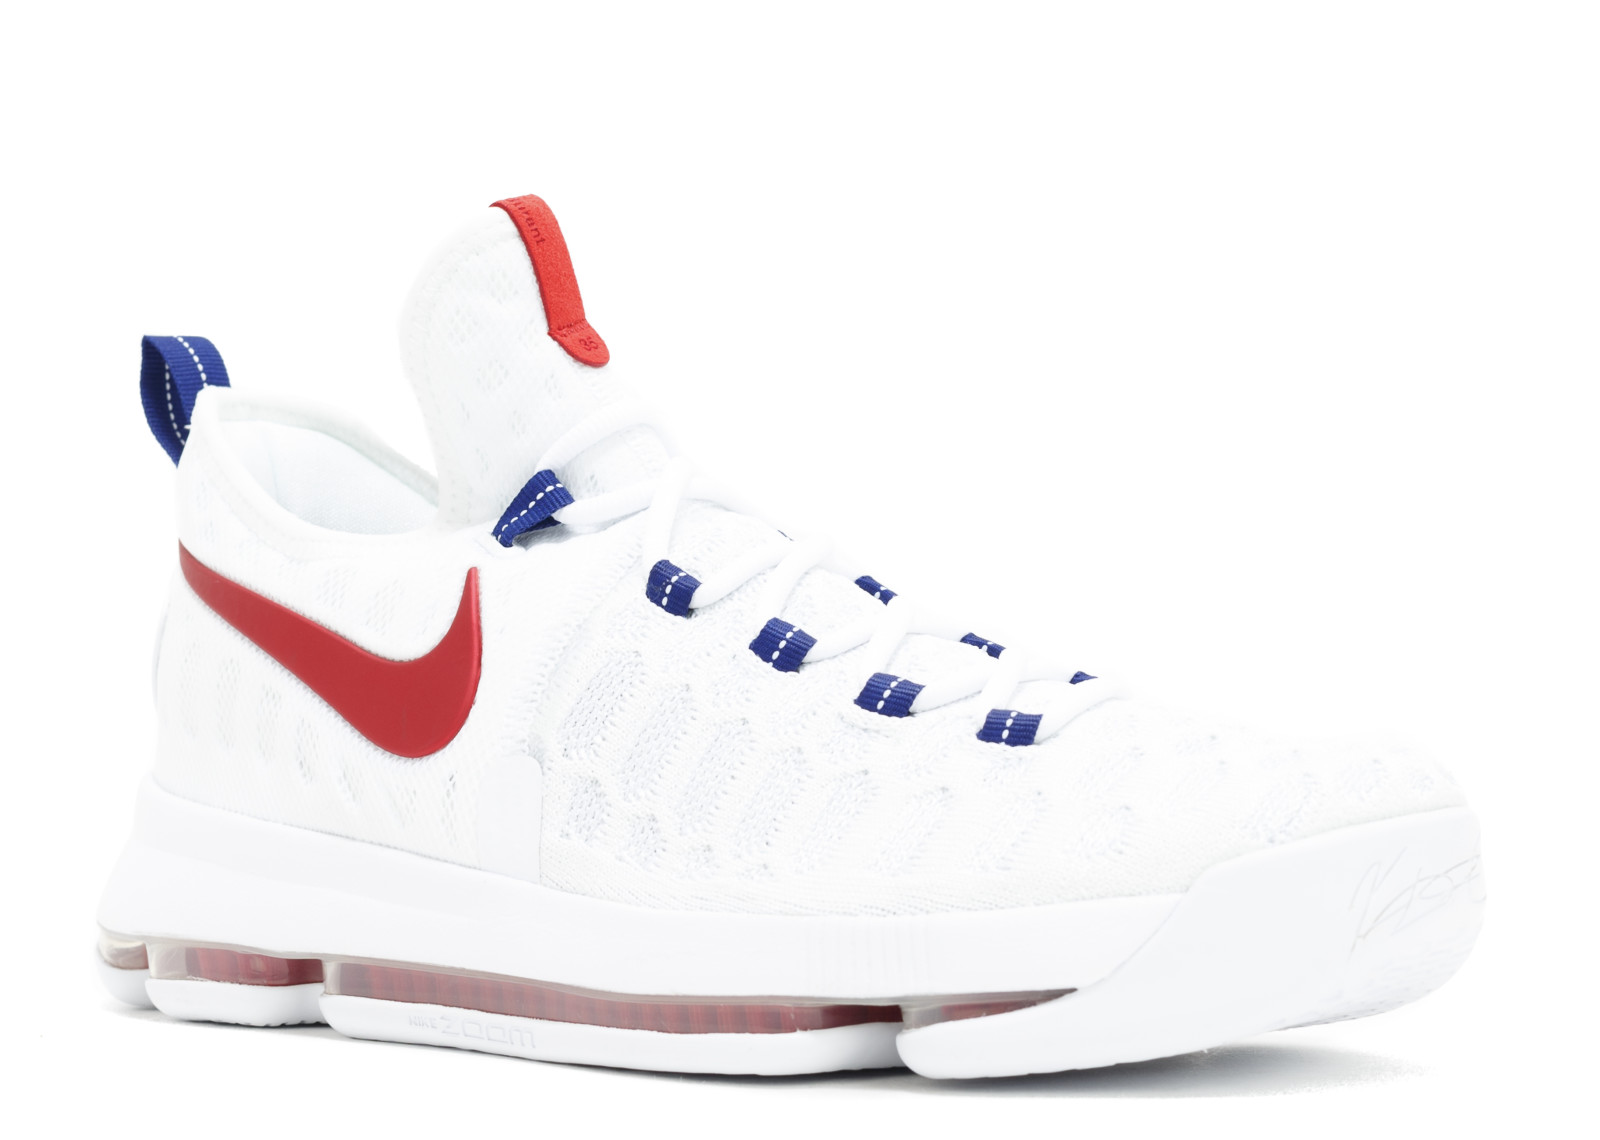 los angeles b1e95 e23a4 Nike - Men - Zoom Kd 9  Usa  - 843392-160 - Size 9